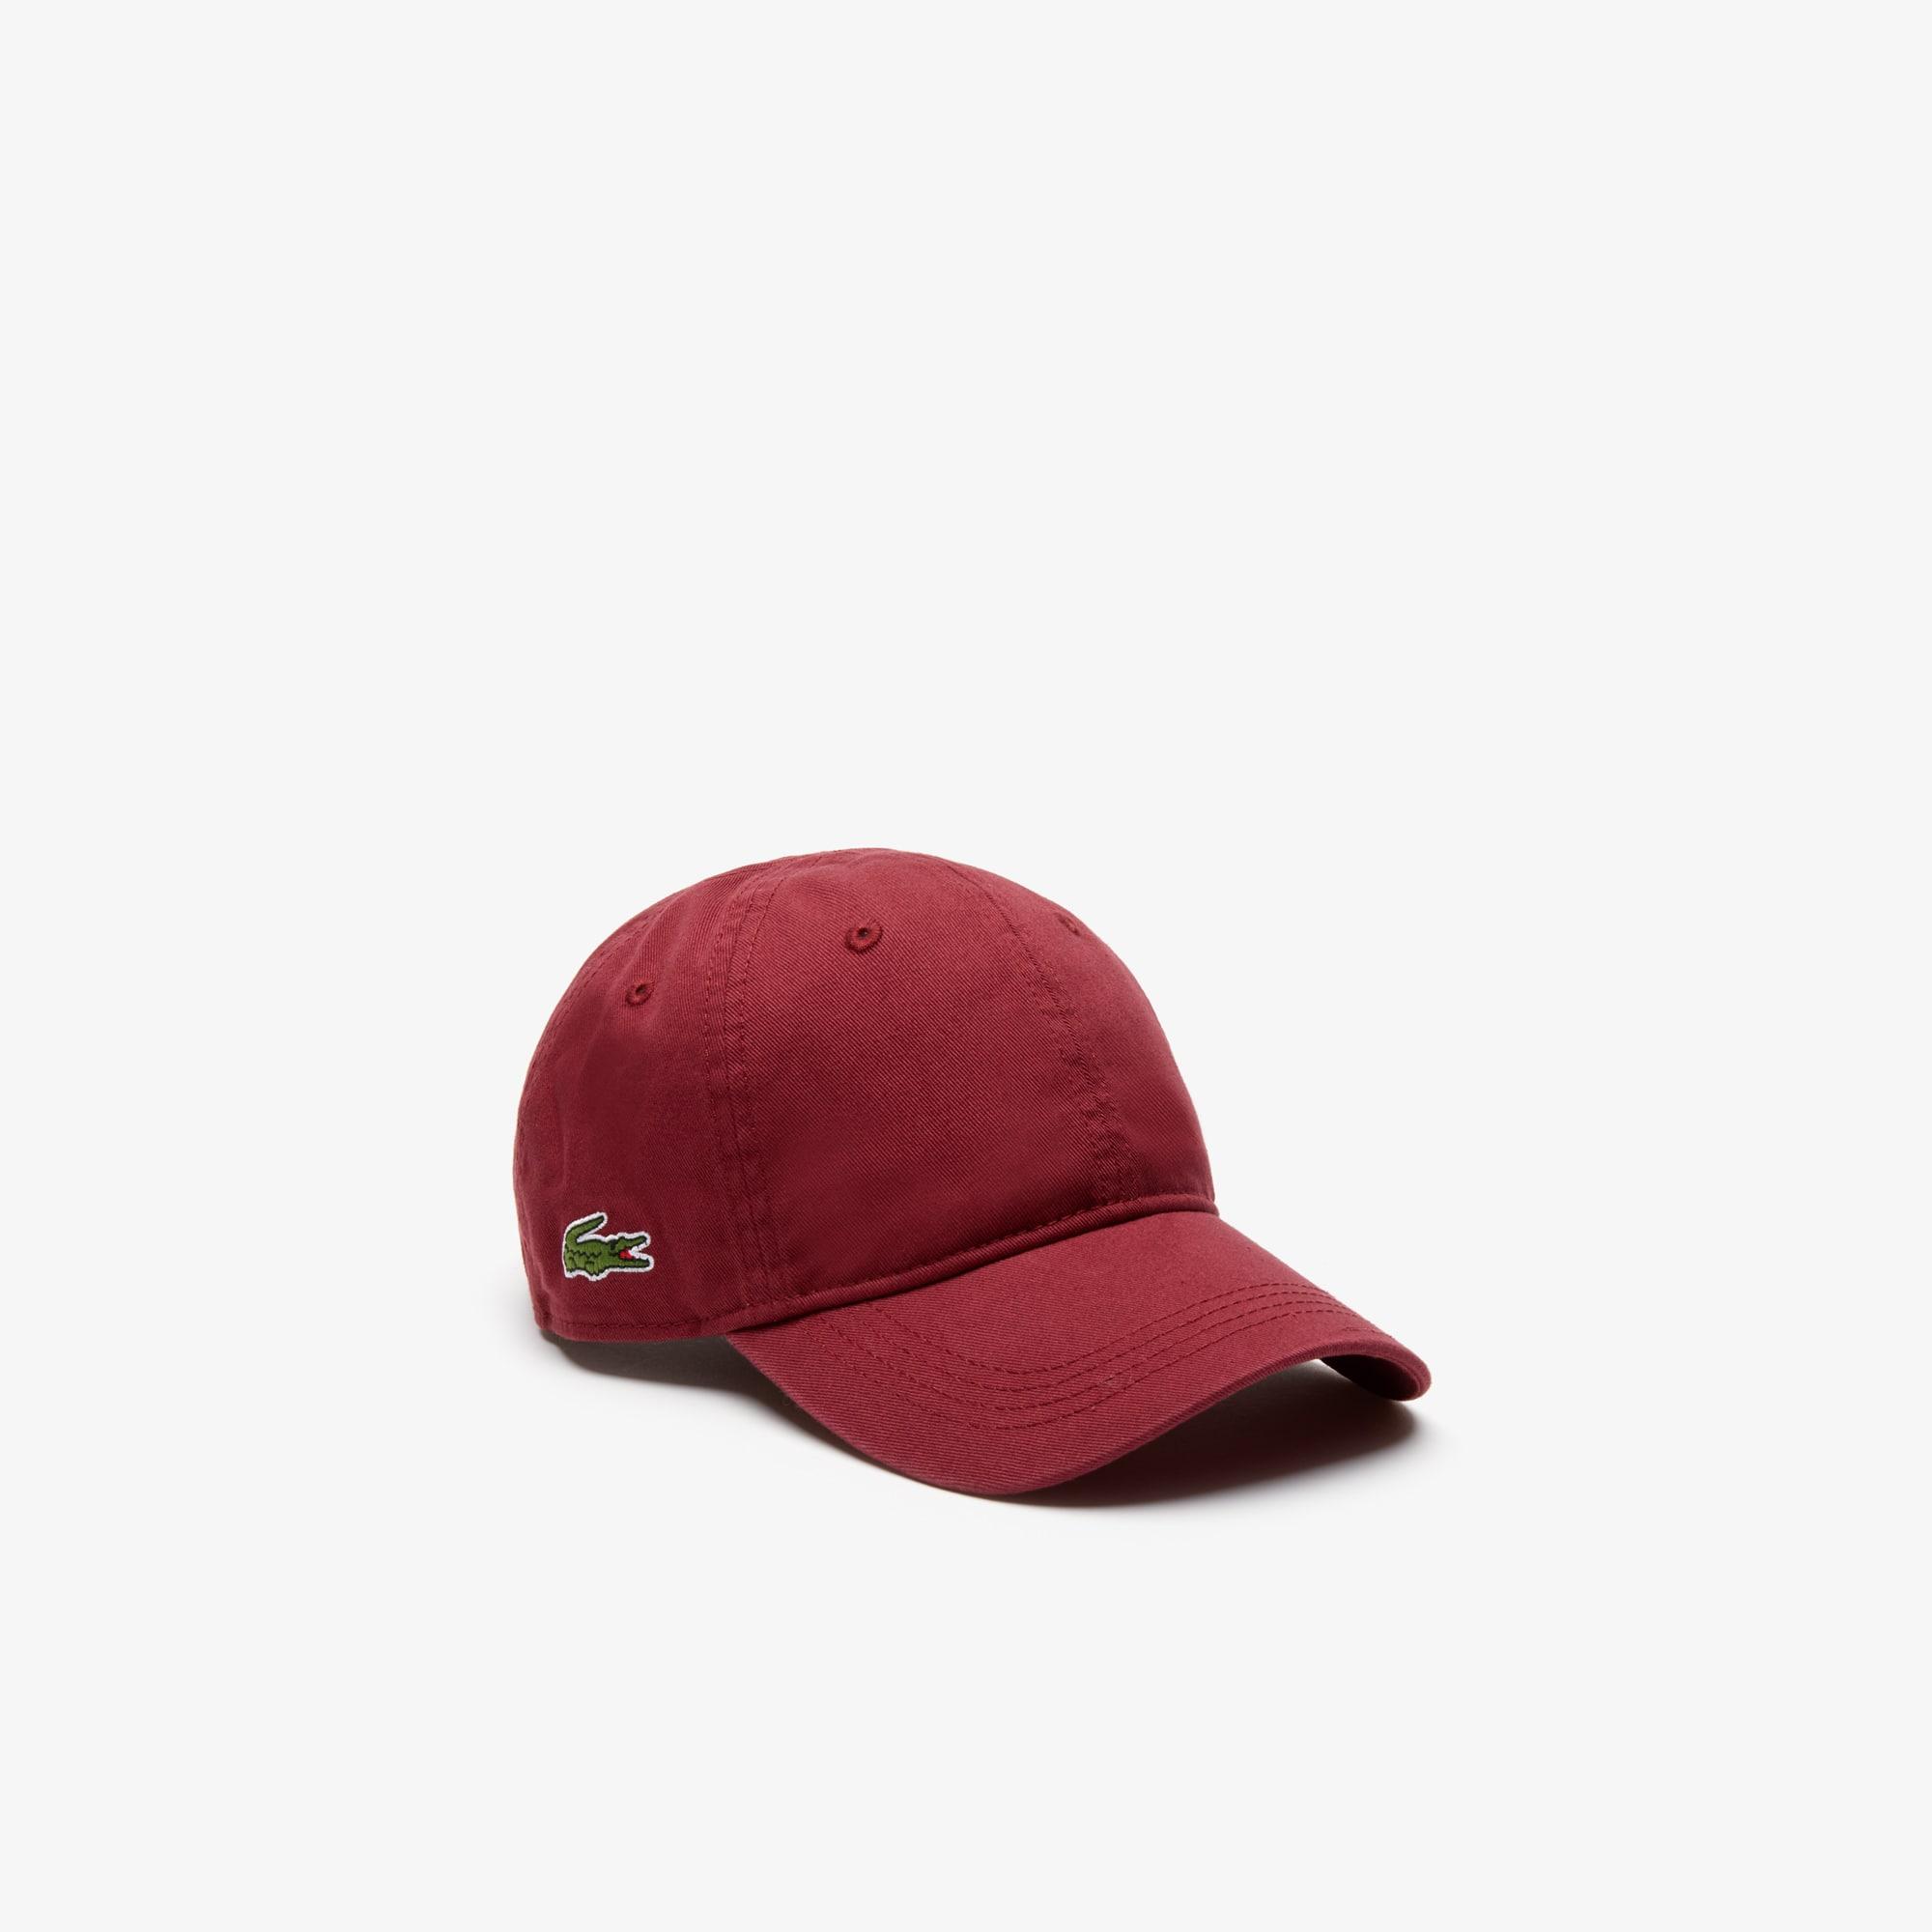 Men's Gabardine cap